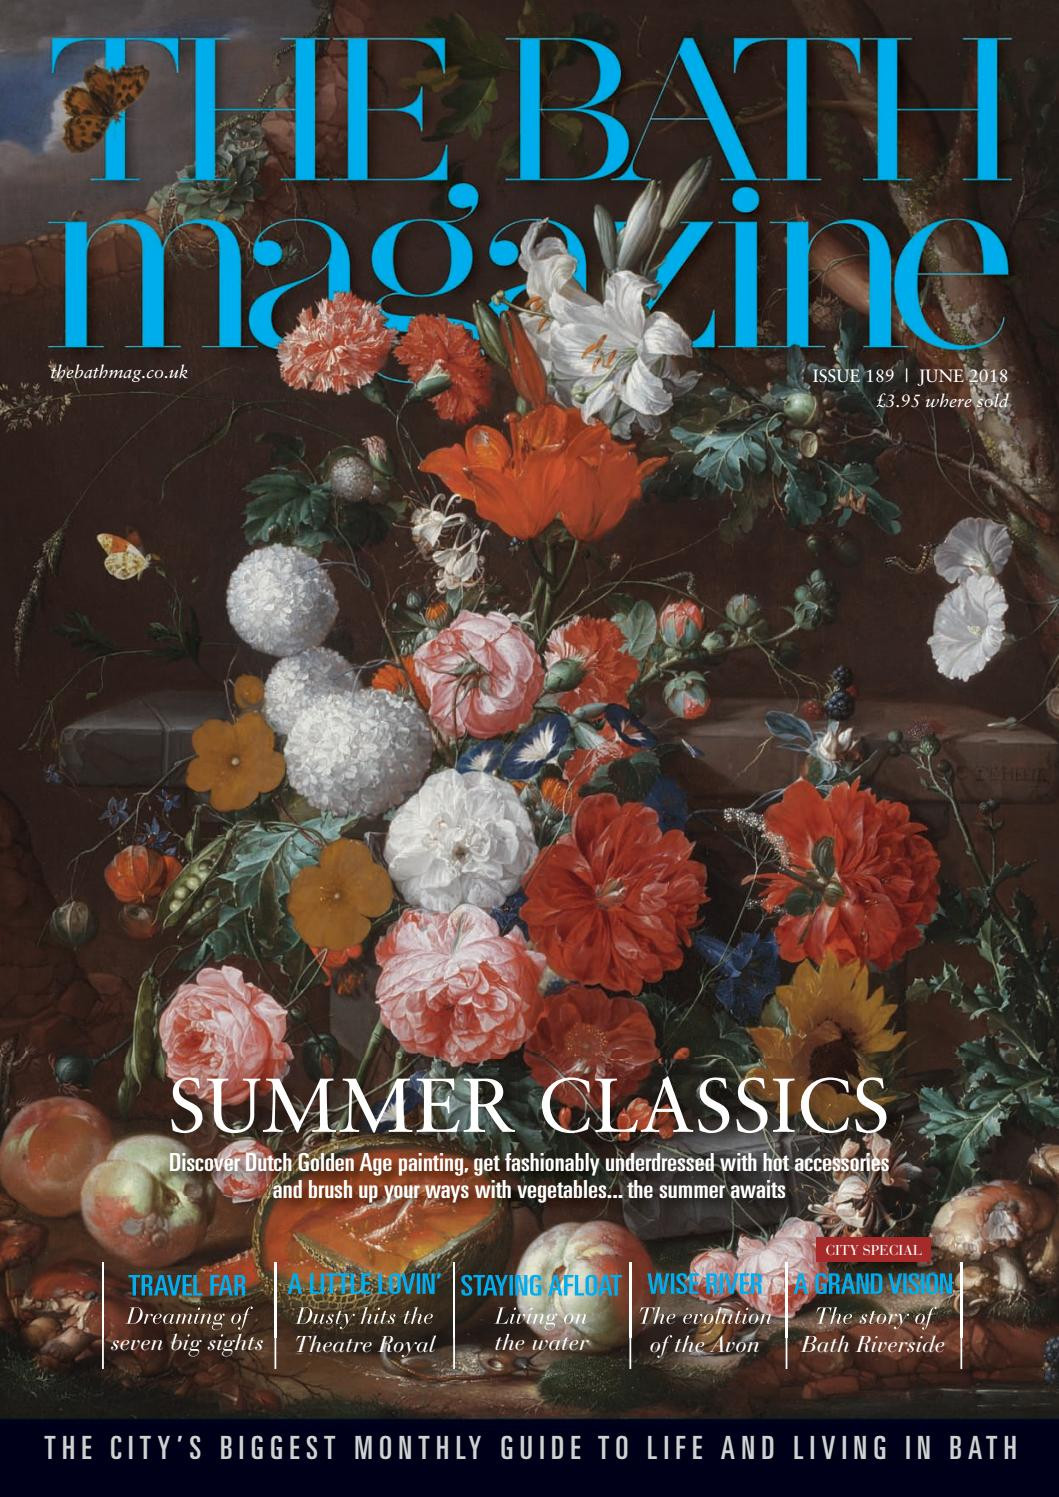 c53f4761db3 The Bath Magazine June 2018 by MC Publishing Limited - issuu